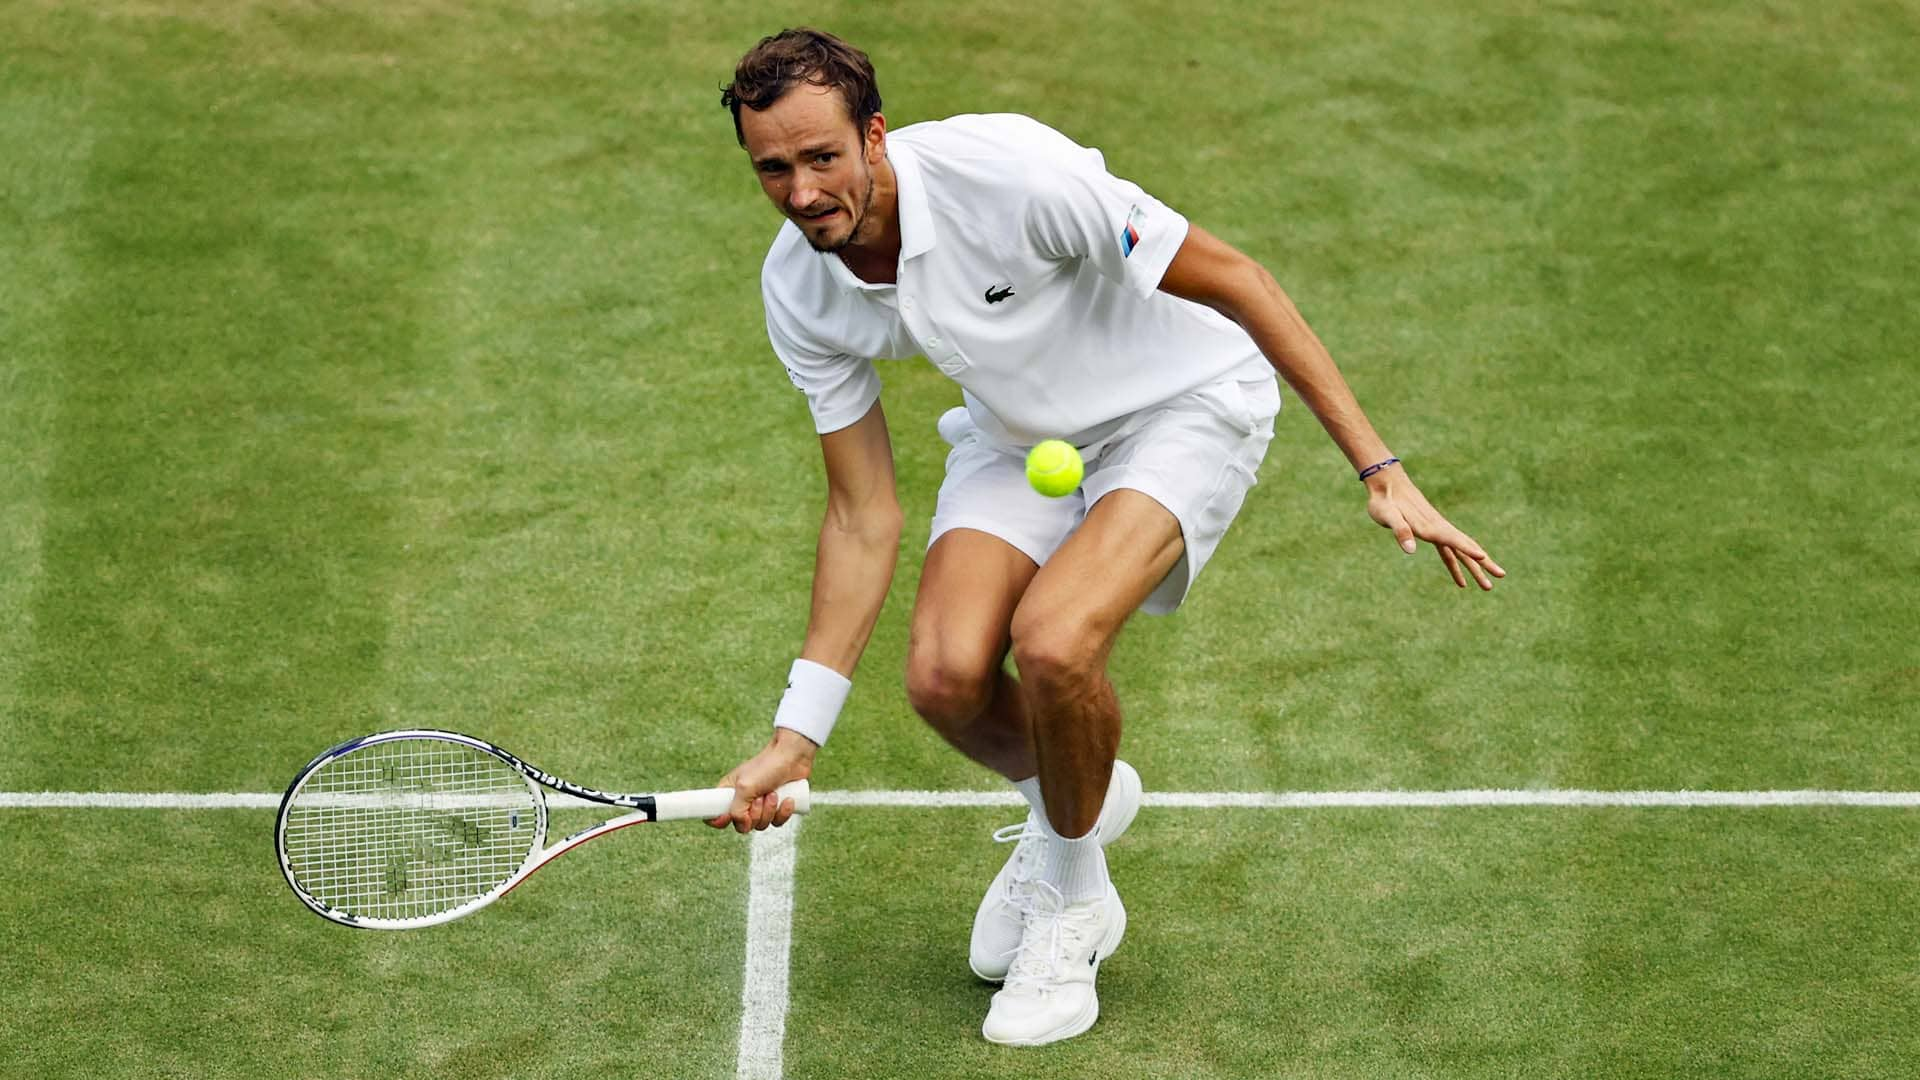 Wimbledon Championships 2021: Daniil Medvedev vs. Hubert Hurkacz Tennis Pick and Prediction